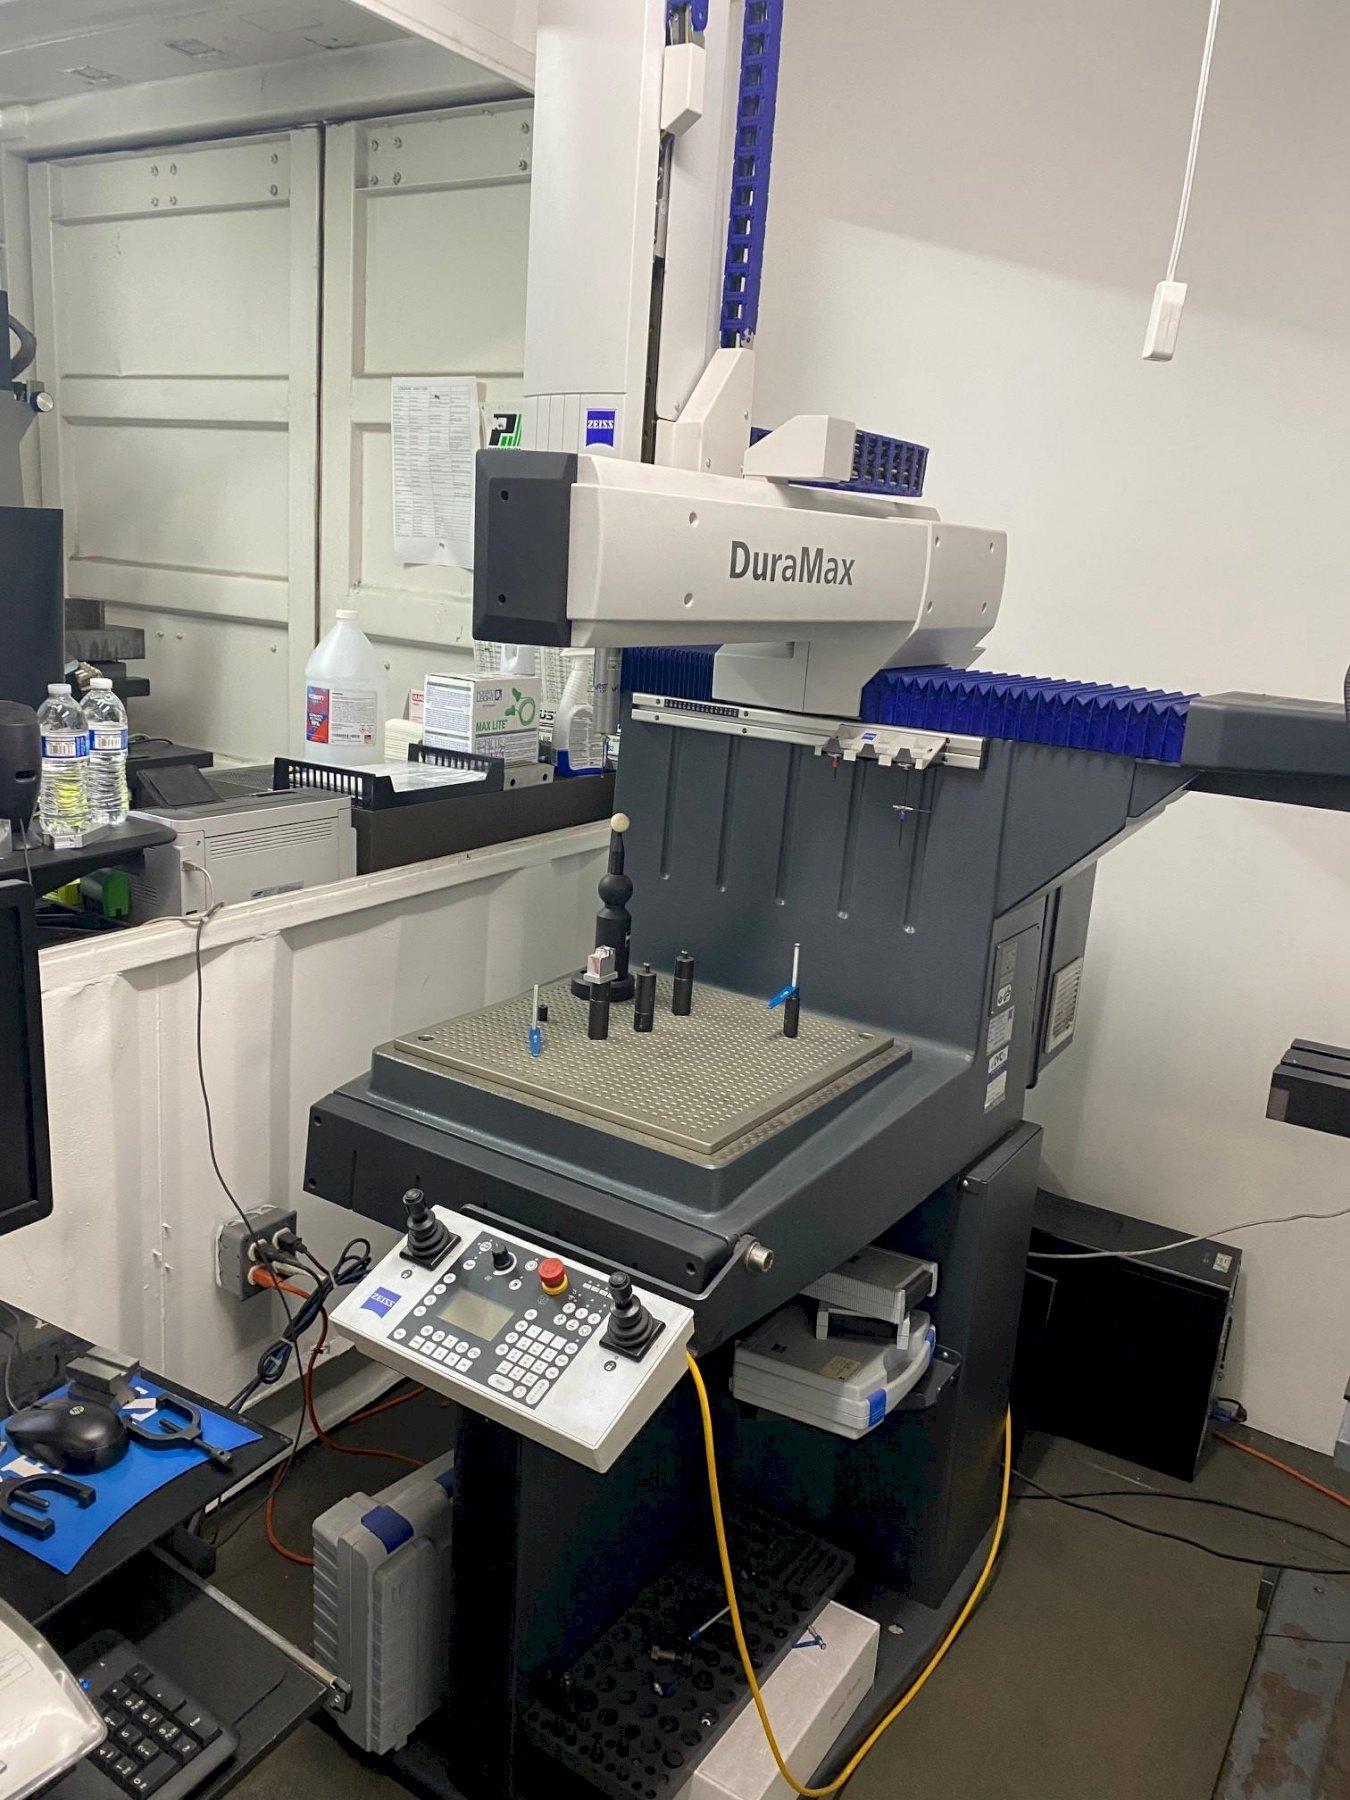 ZEISS2015 Zeiss Duramax 5/5/5 Coordinate Measuring Machine (CMM) (#33215)